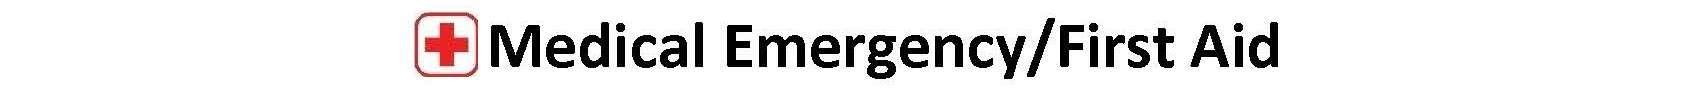 Emergency Preparedness Plan_Page_11